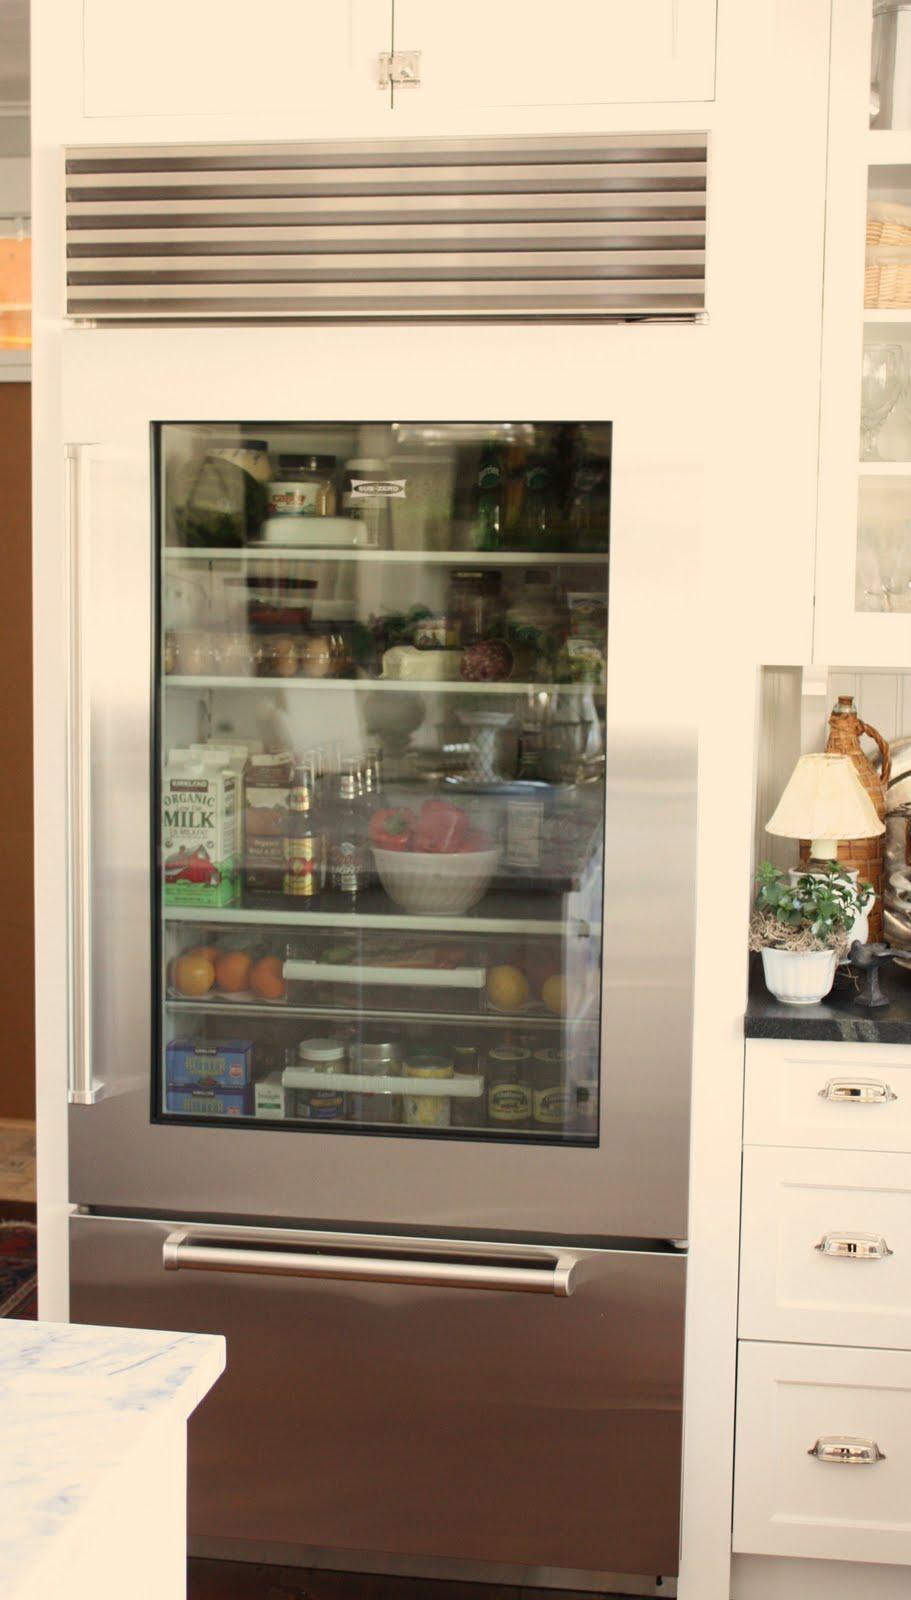 Sub Zero Glass Door Refrigerator for the love of a house: the glass door refrigerator